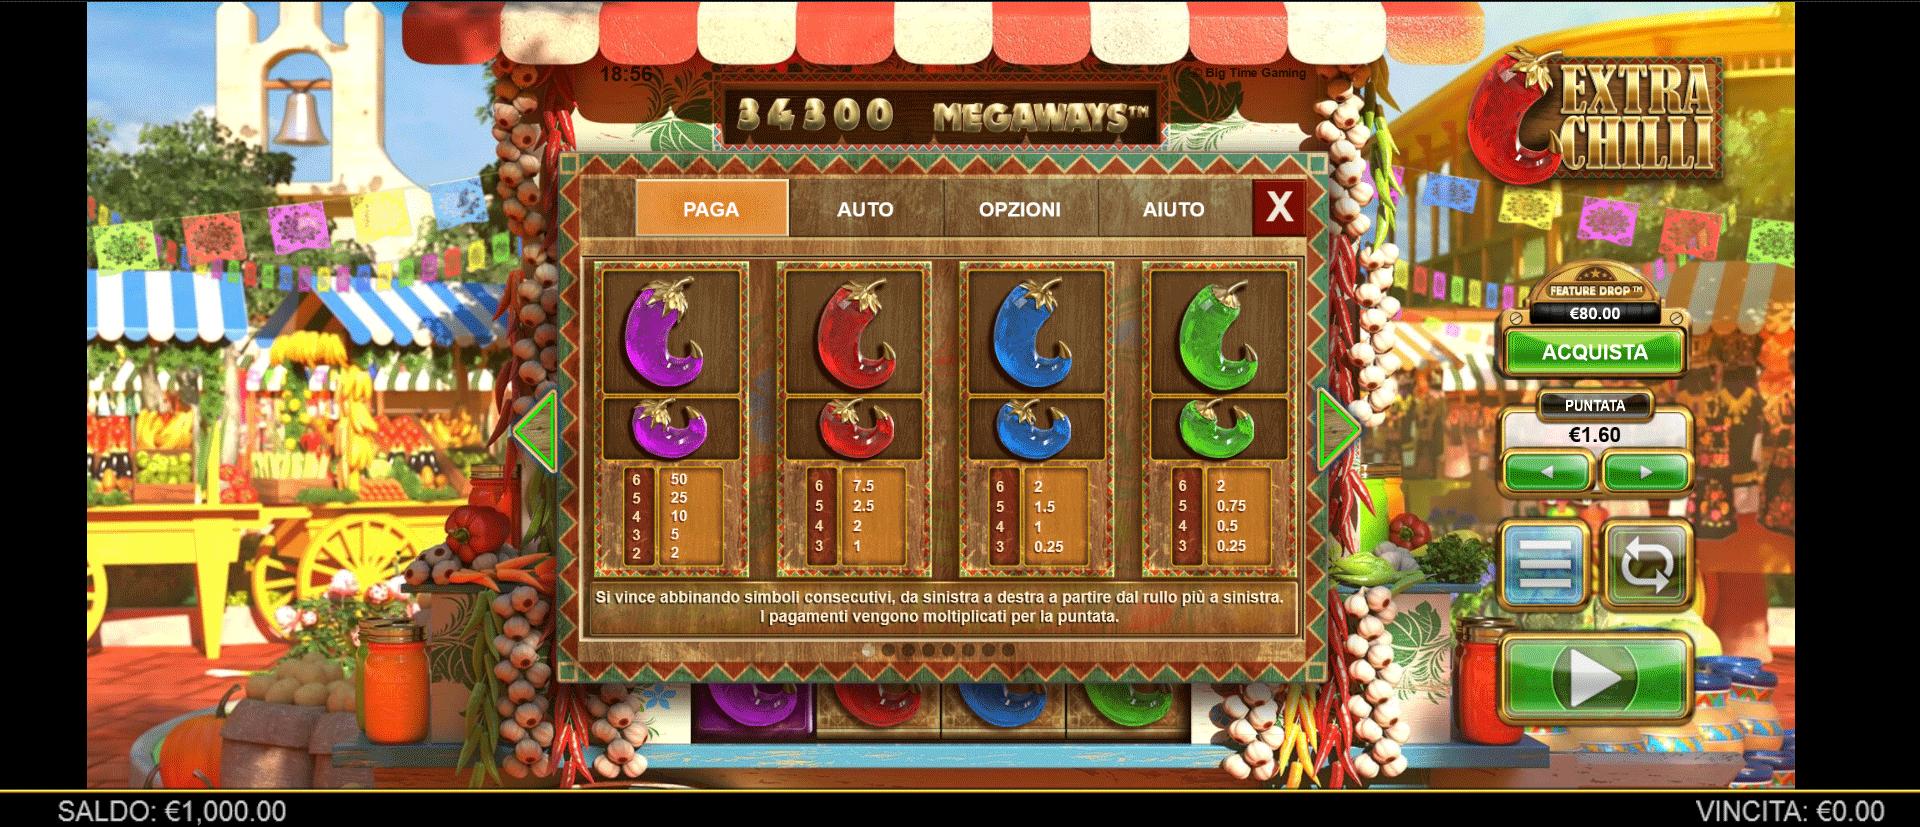 paytable slot machine extra chilli